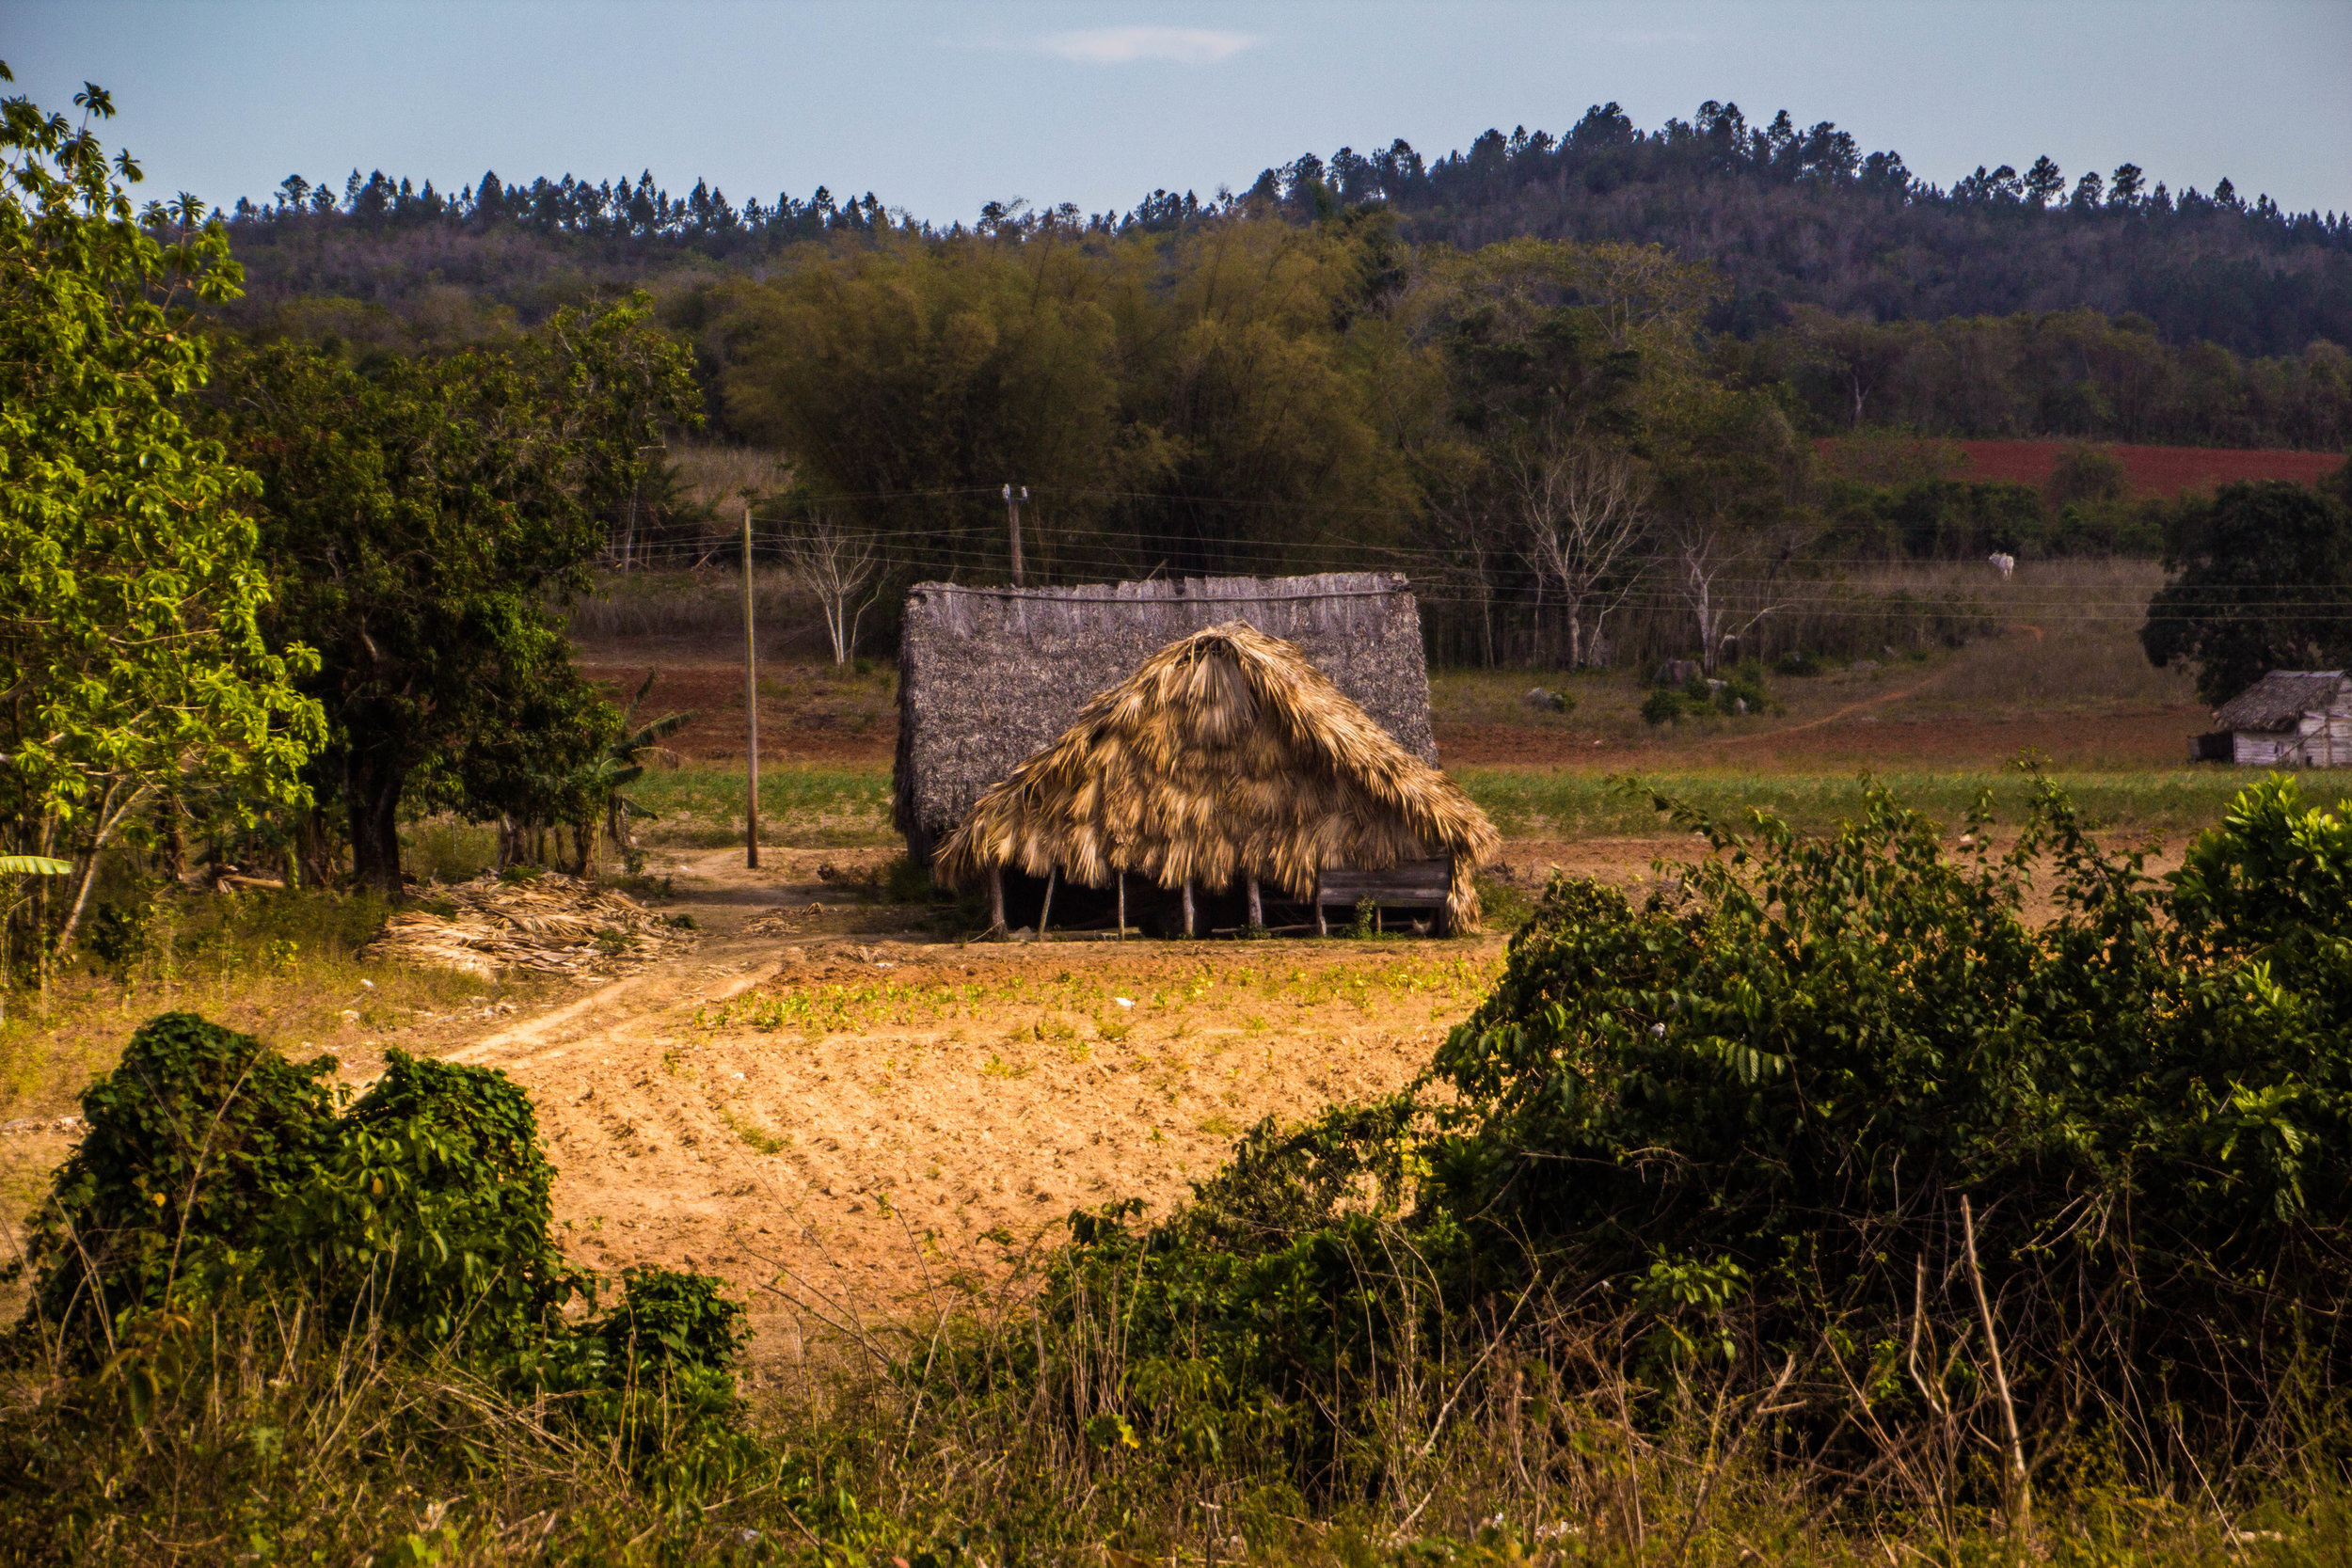 tobacco agriculture viñales cuba-1-2-2.jpg